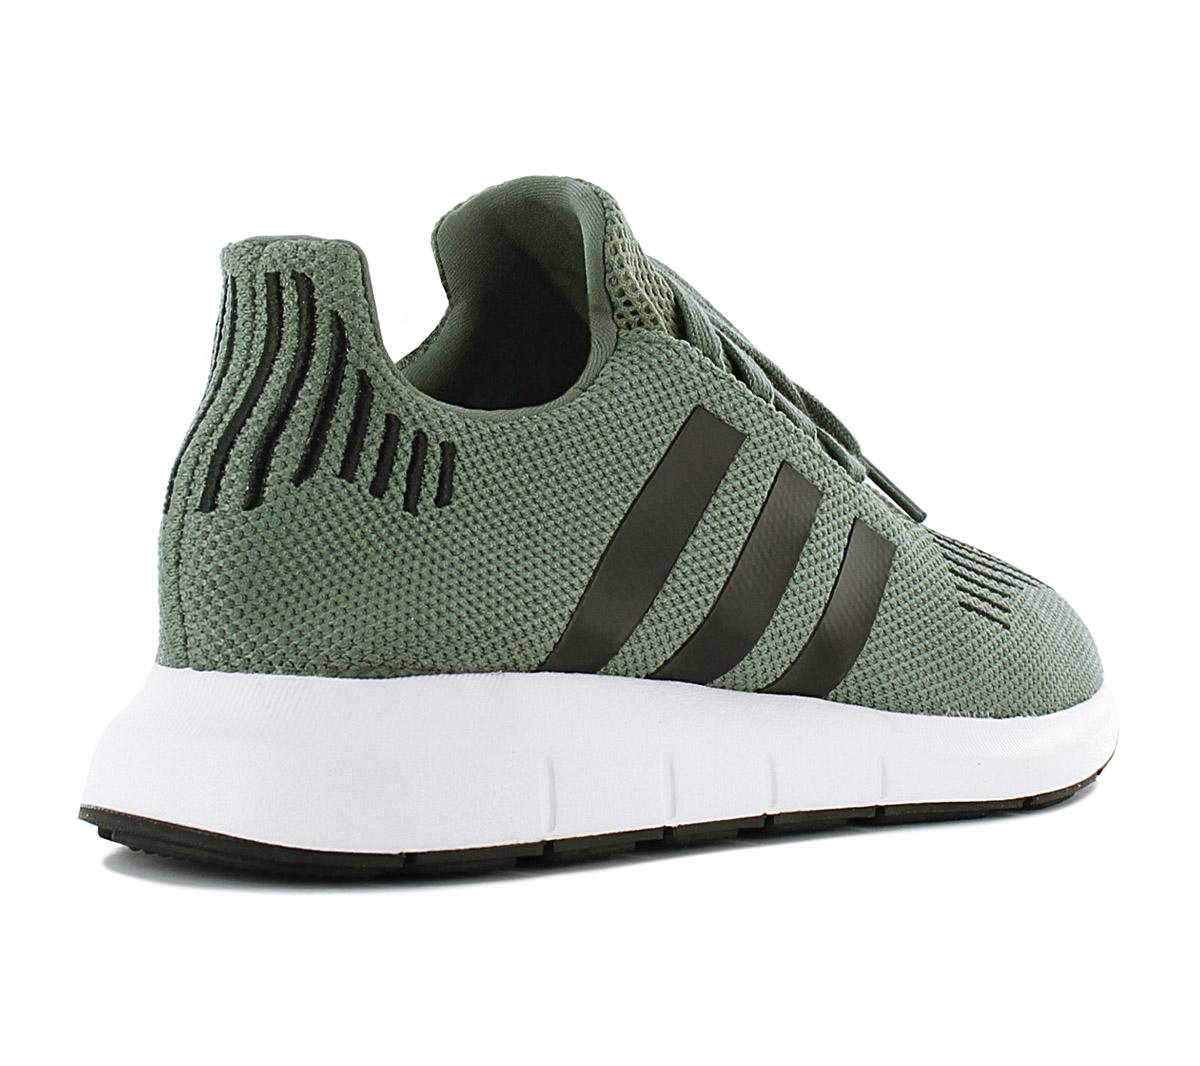 3abde4167b76e NEW adidas Originals Swift Run CG4115 Men´s Shoes Trainers Sneakers ...